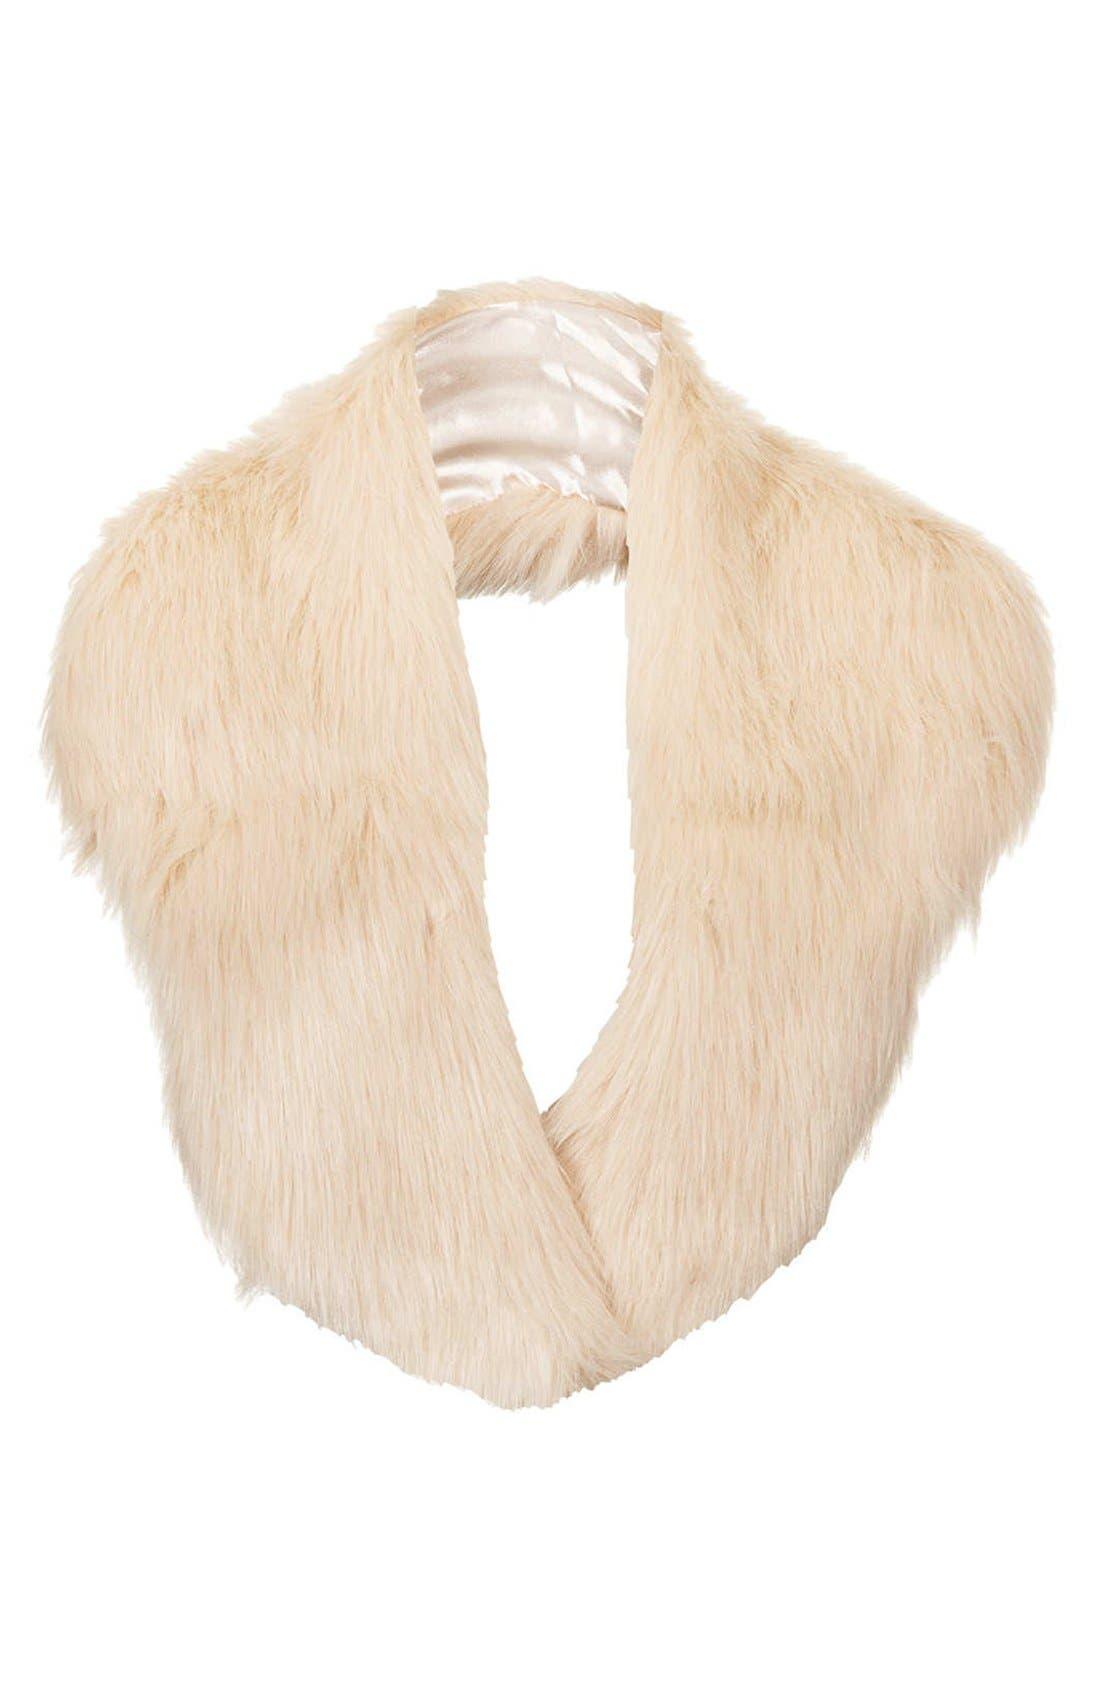 Alternate Image 1 Selected - Topshop Faux Fur Stole